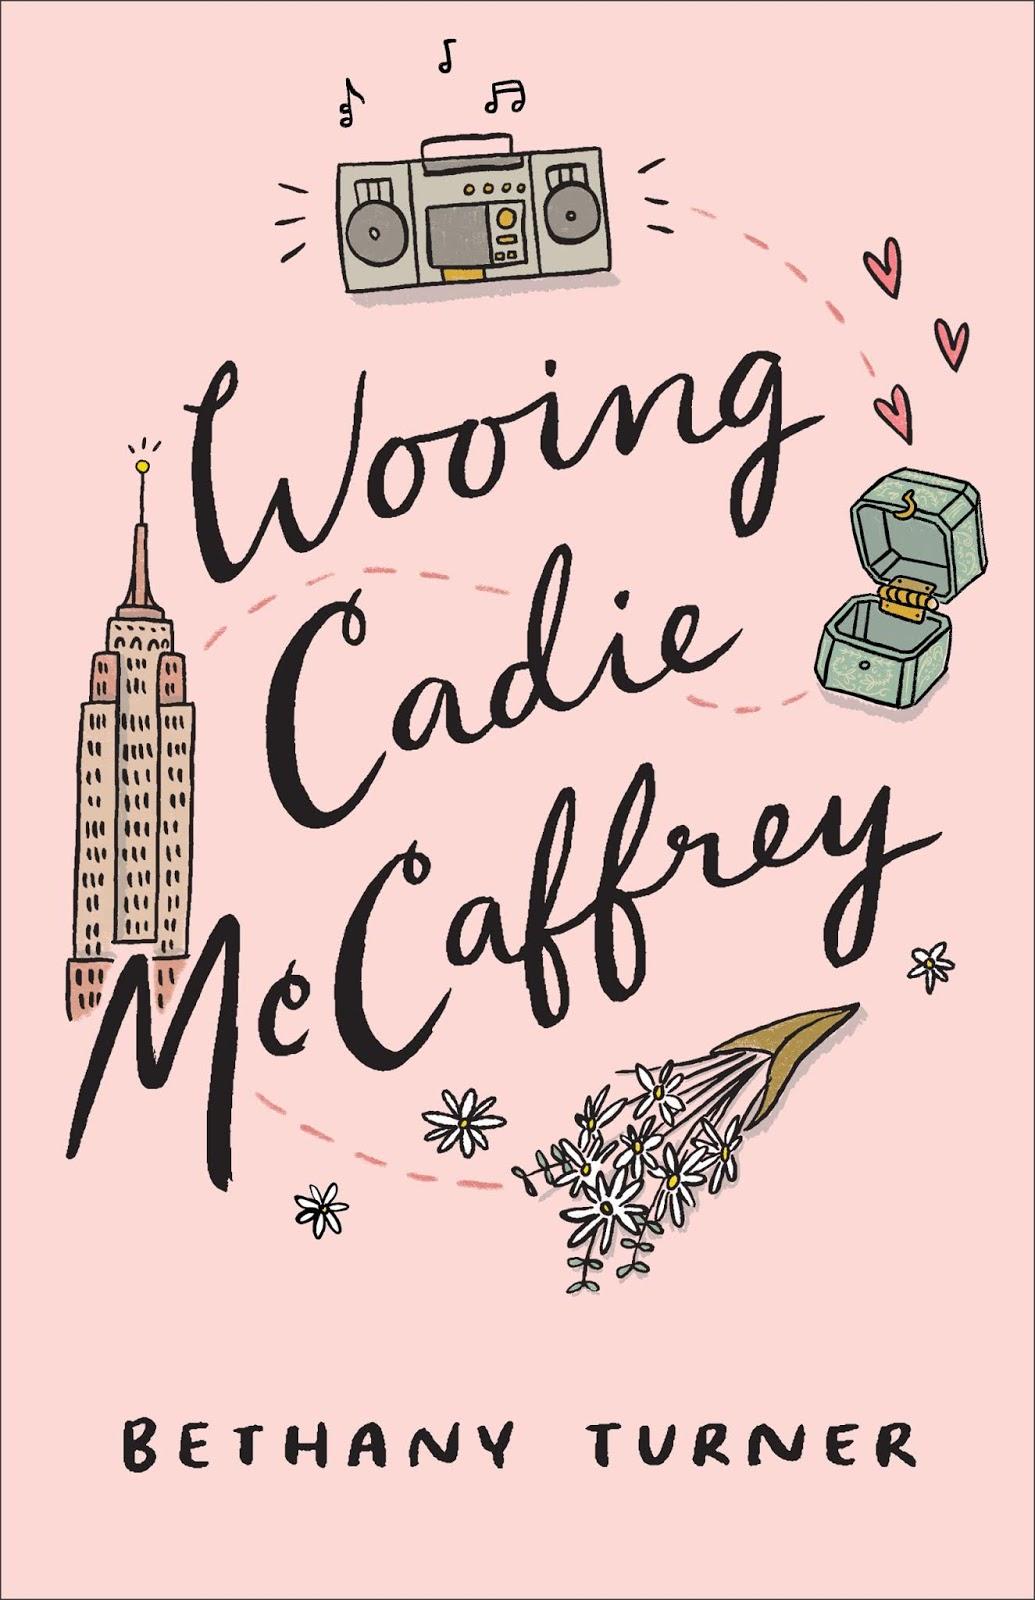 Wooing Cadie McCaffrey book cover